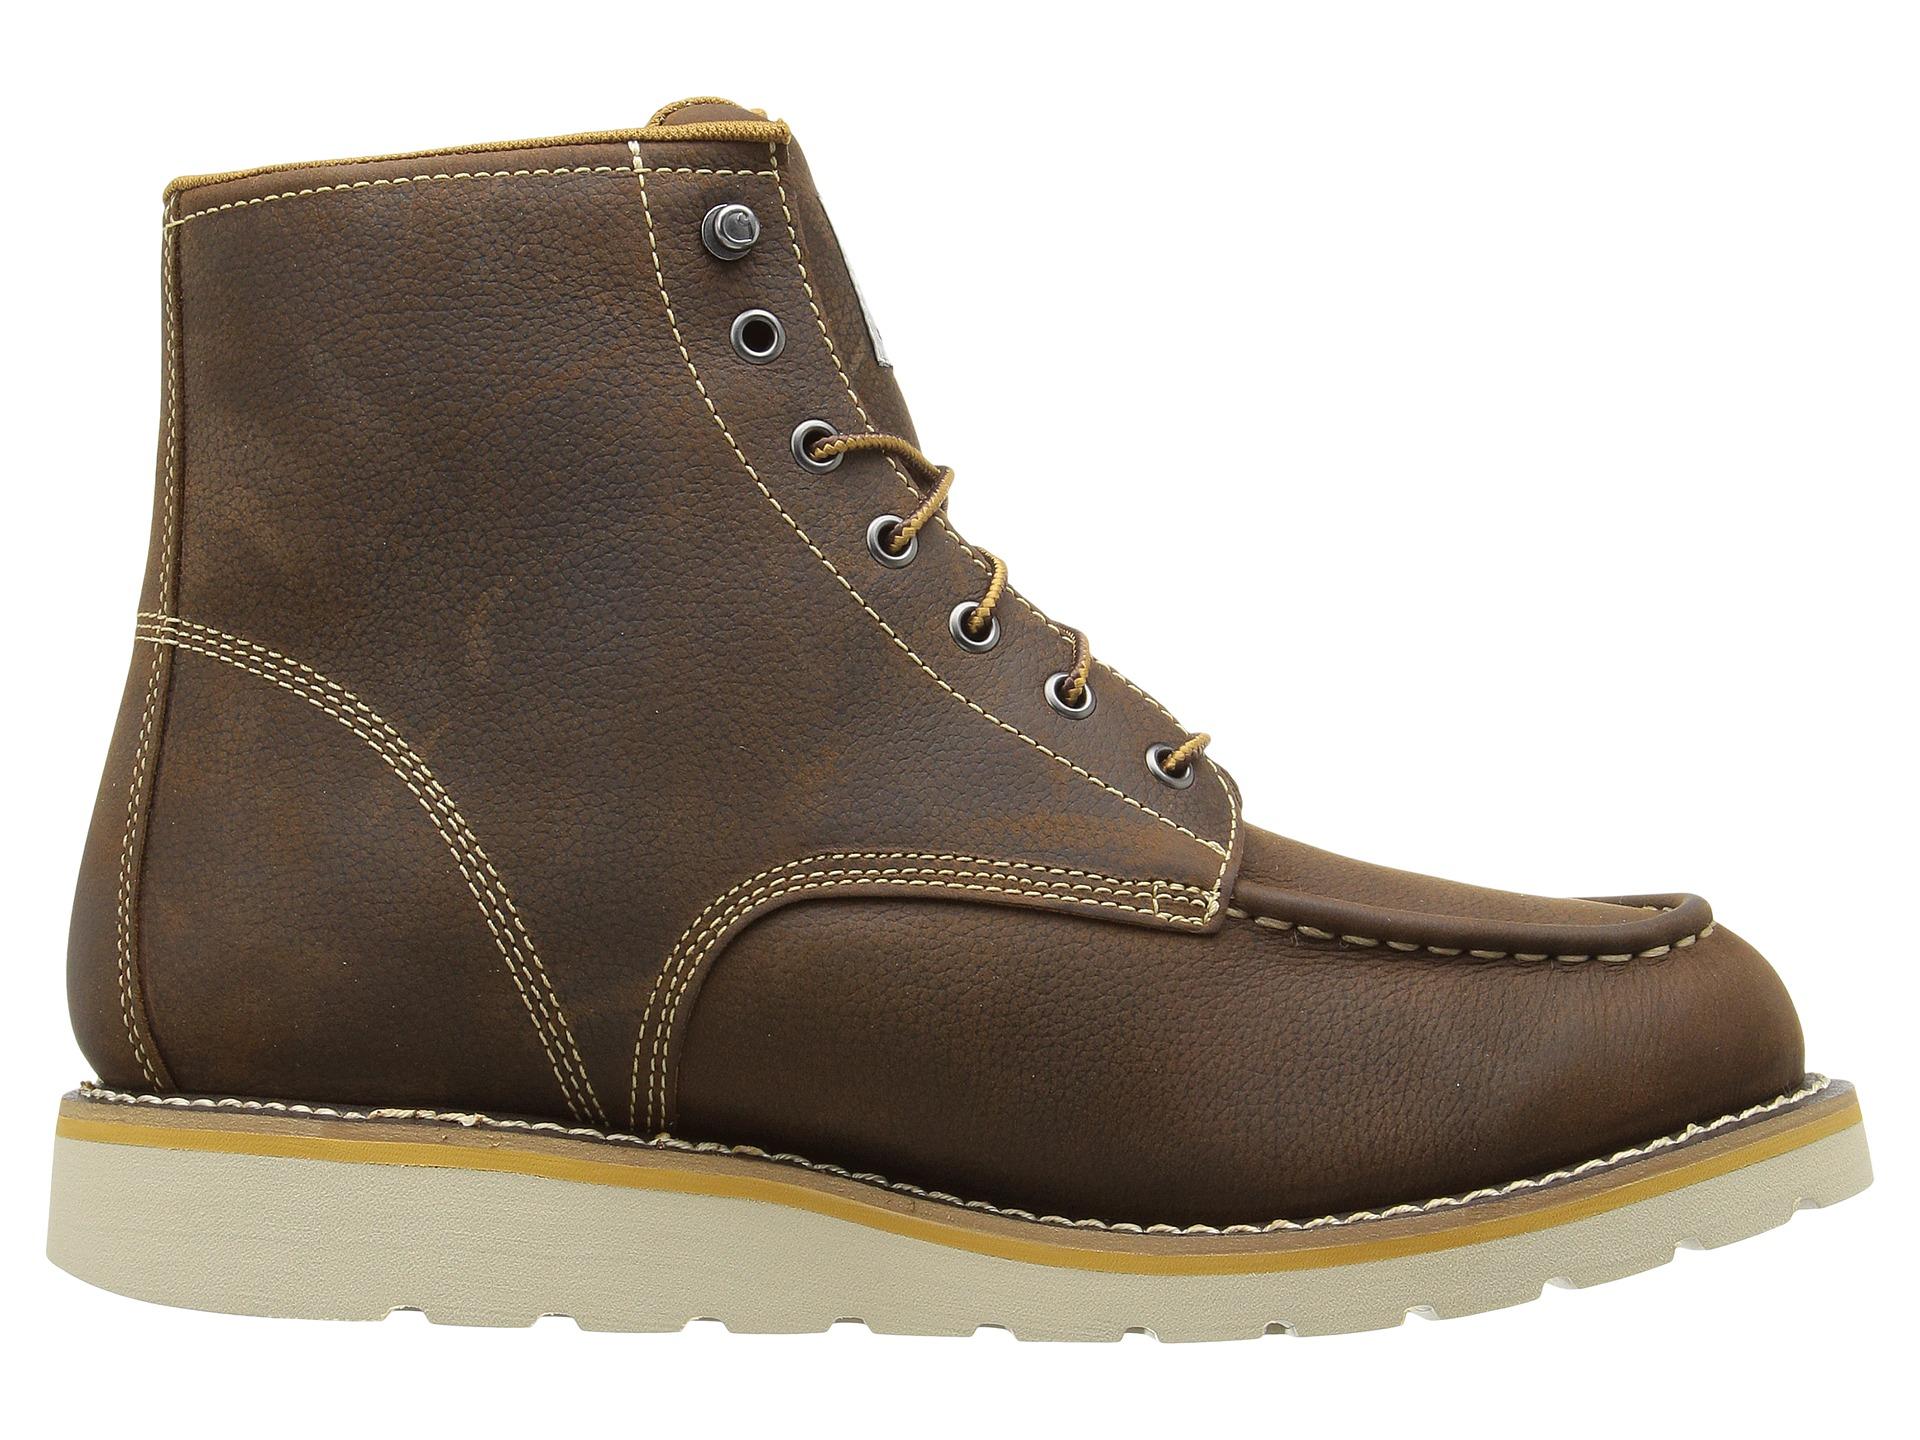 carhartt 6 quot waterproof wedge boot at zappos